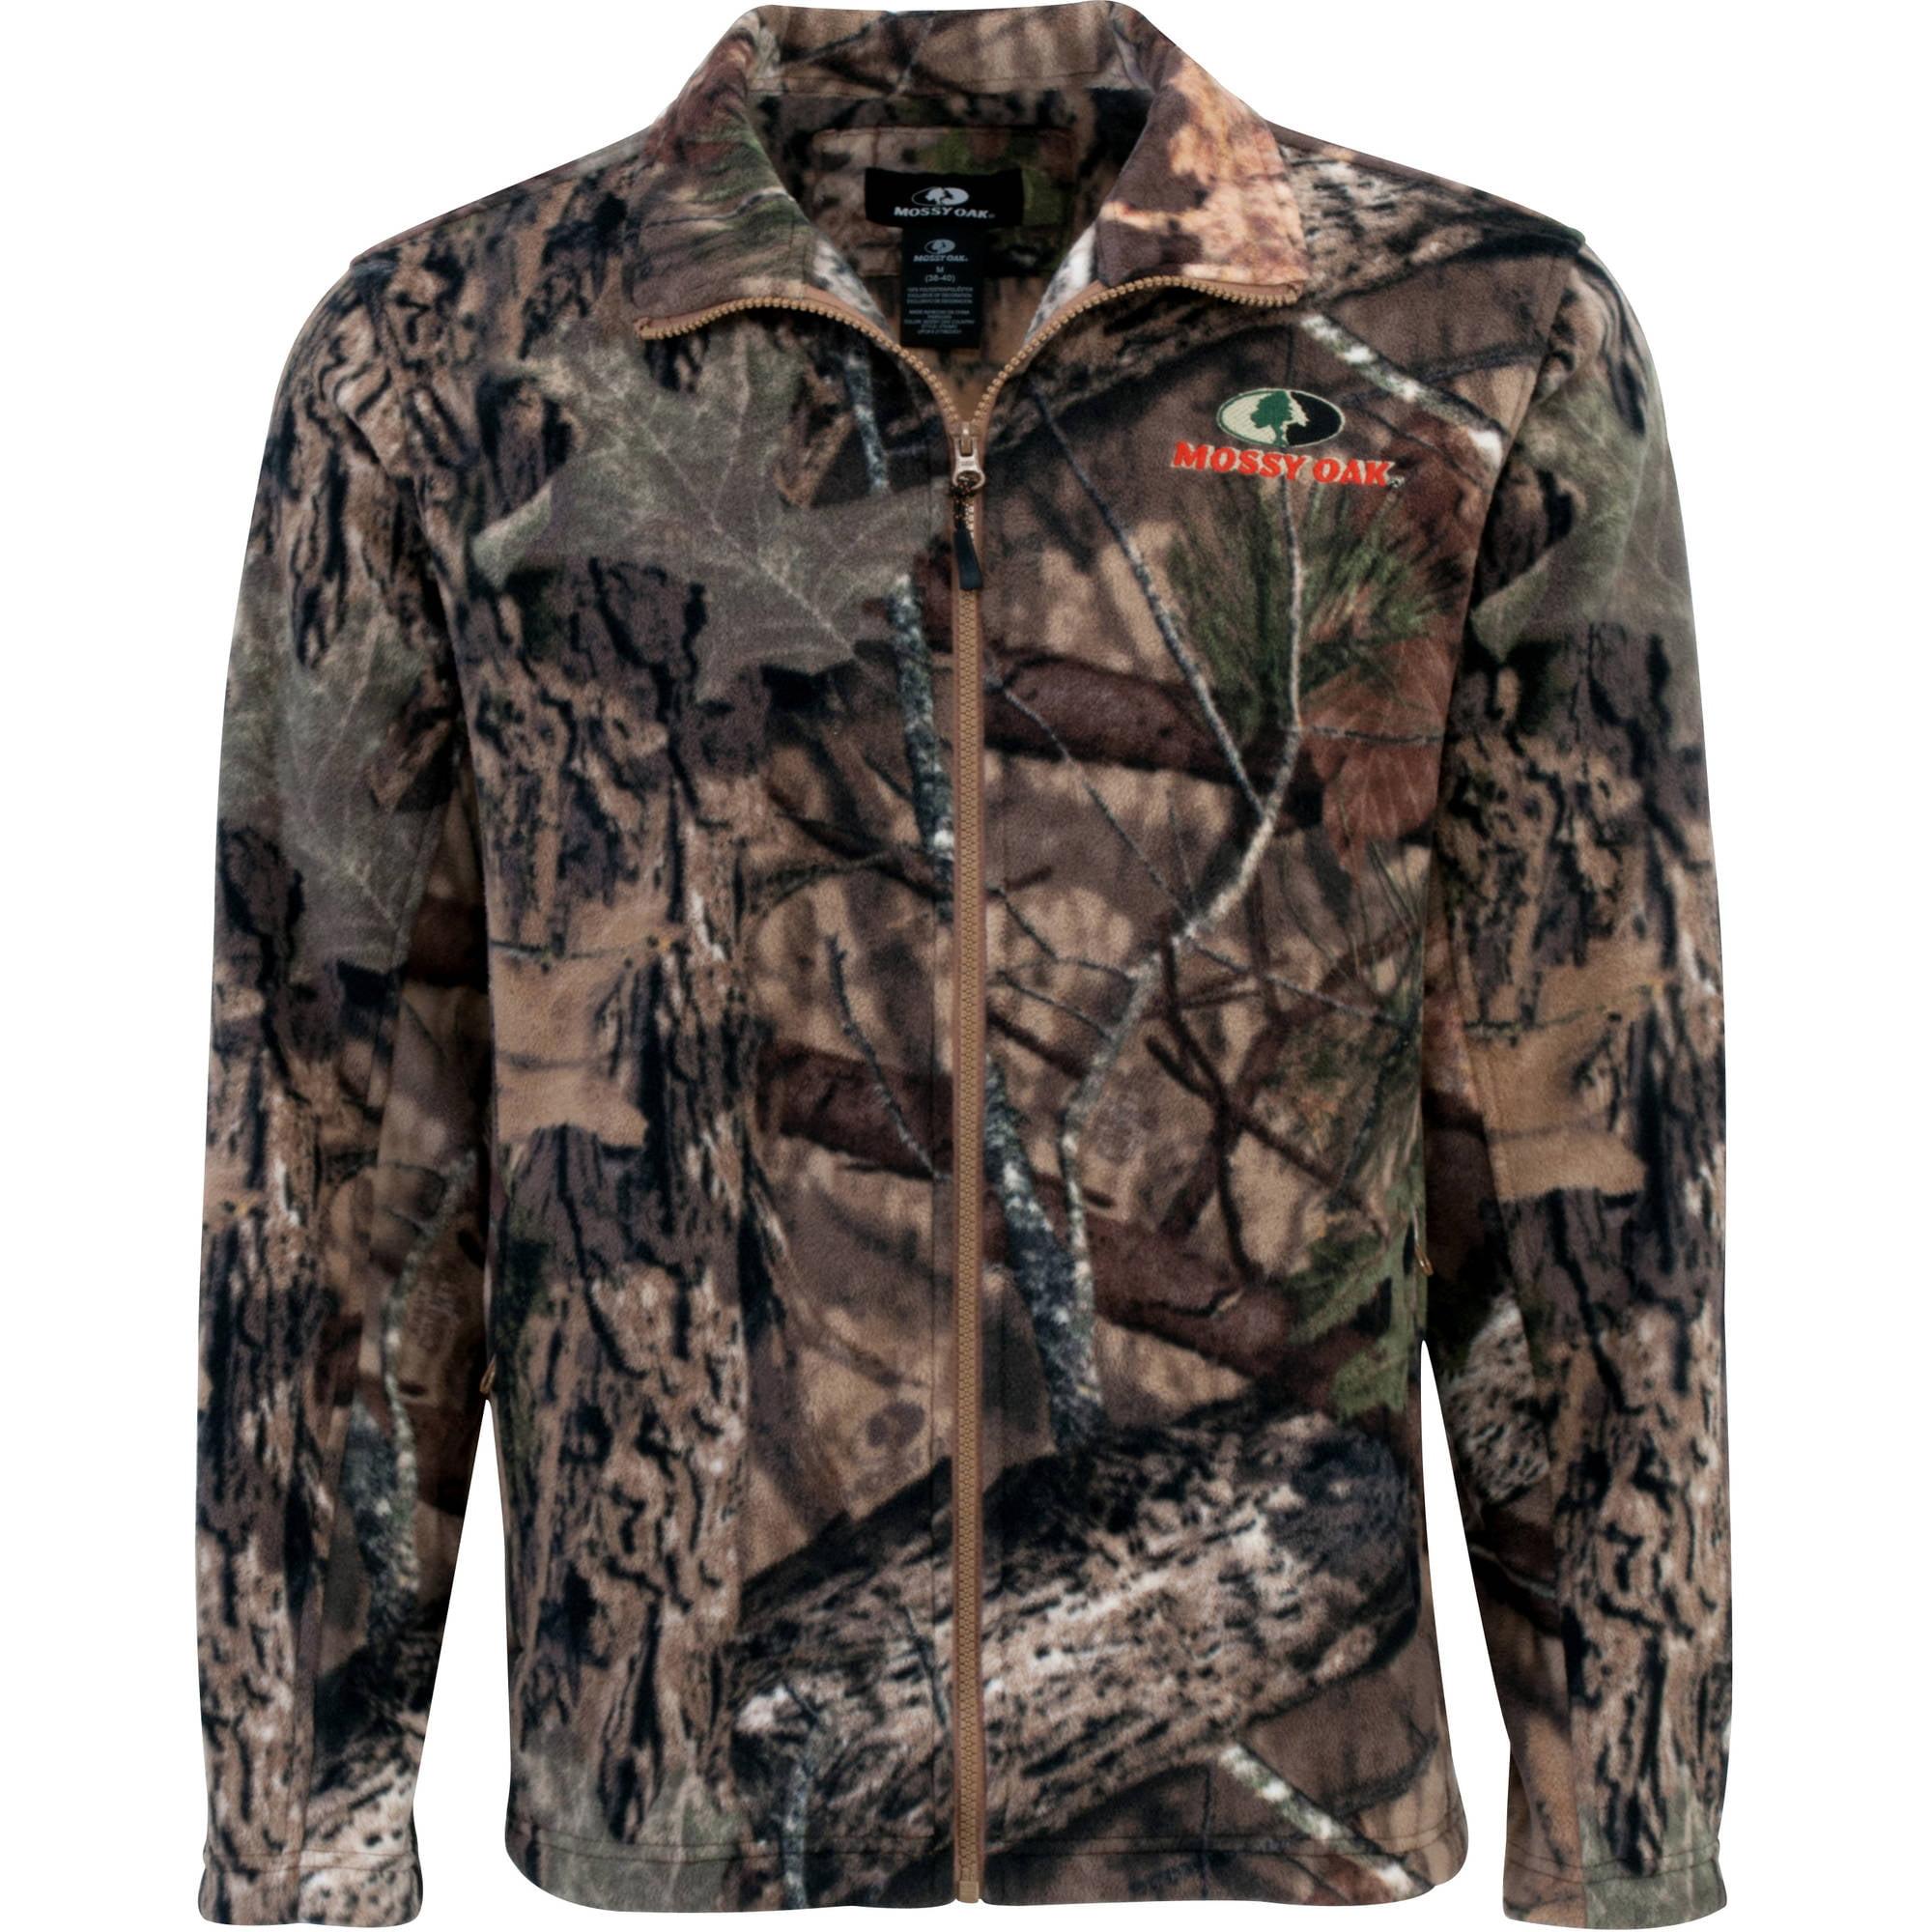 Men's Micro Fleece Jacket by